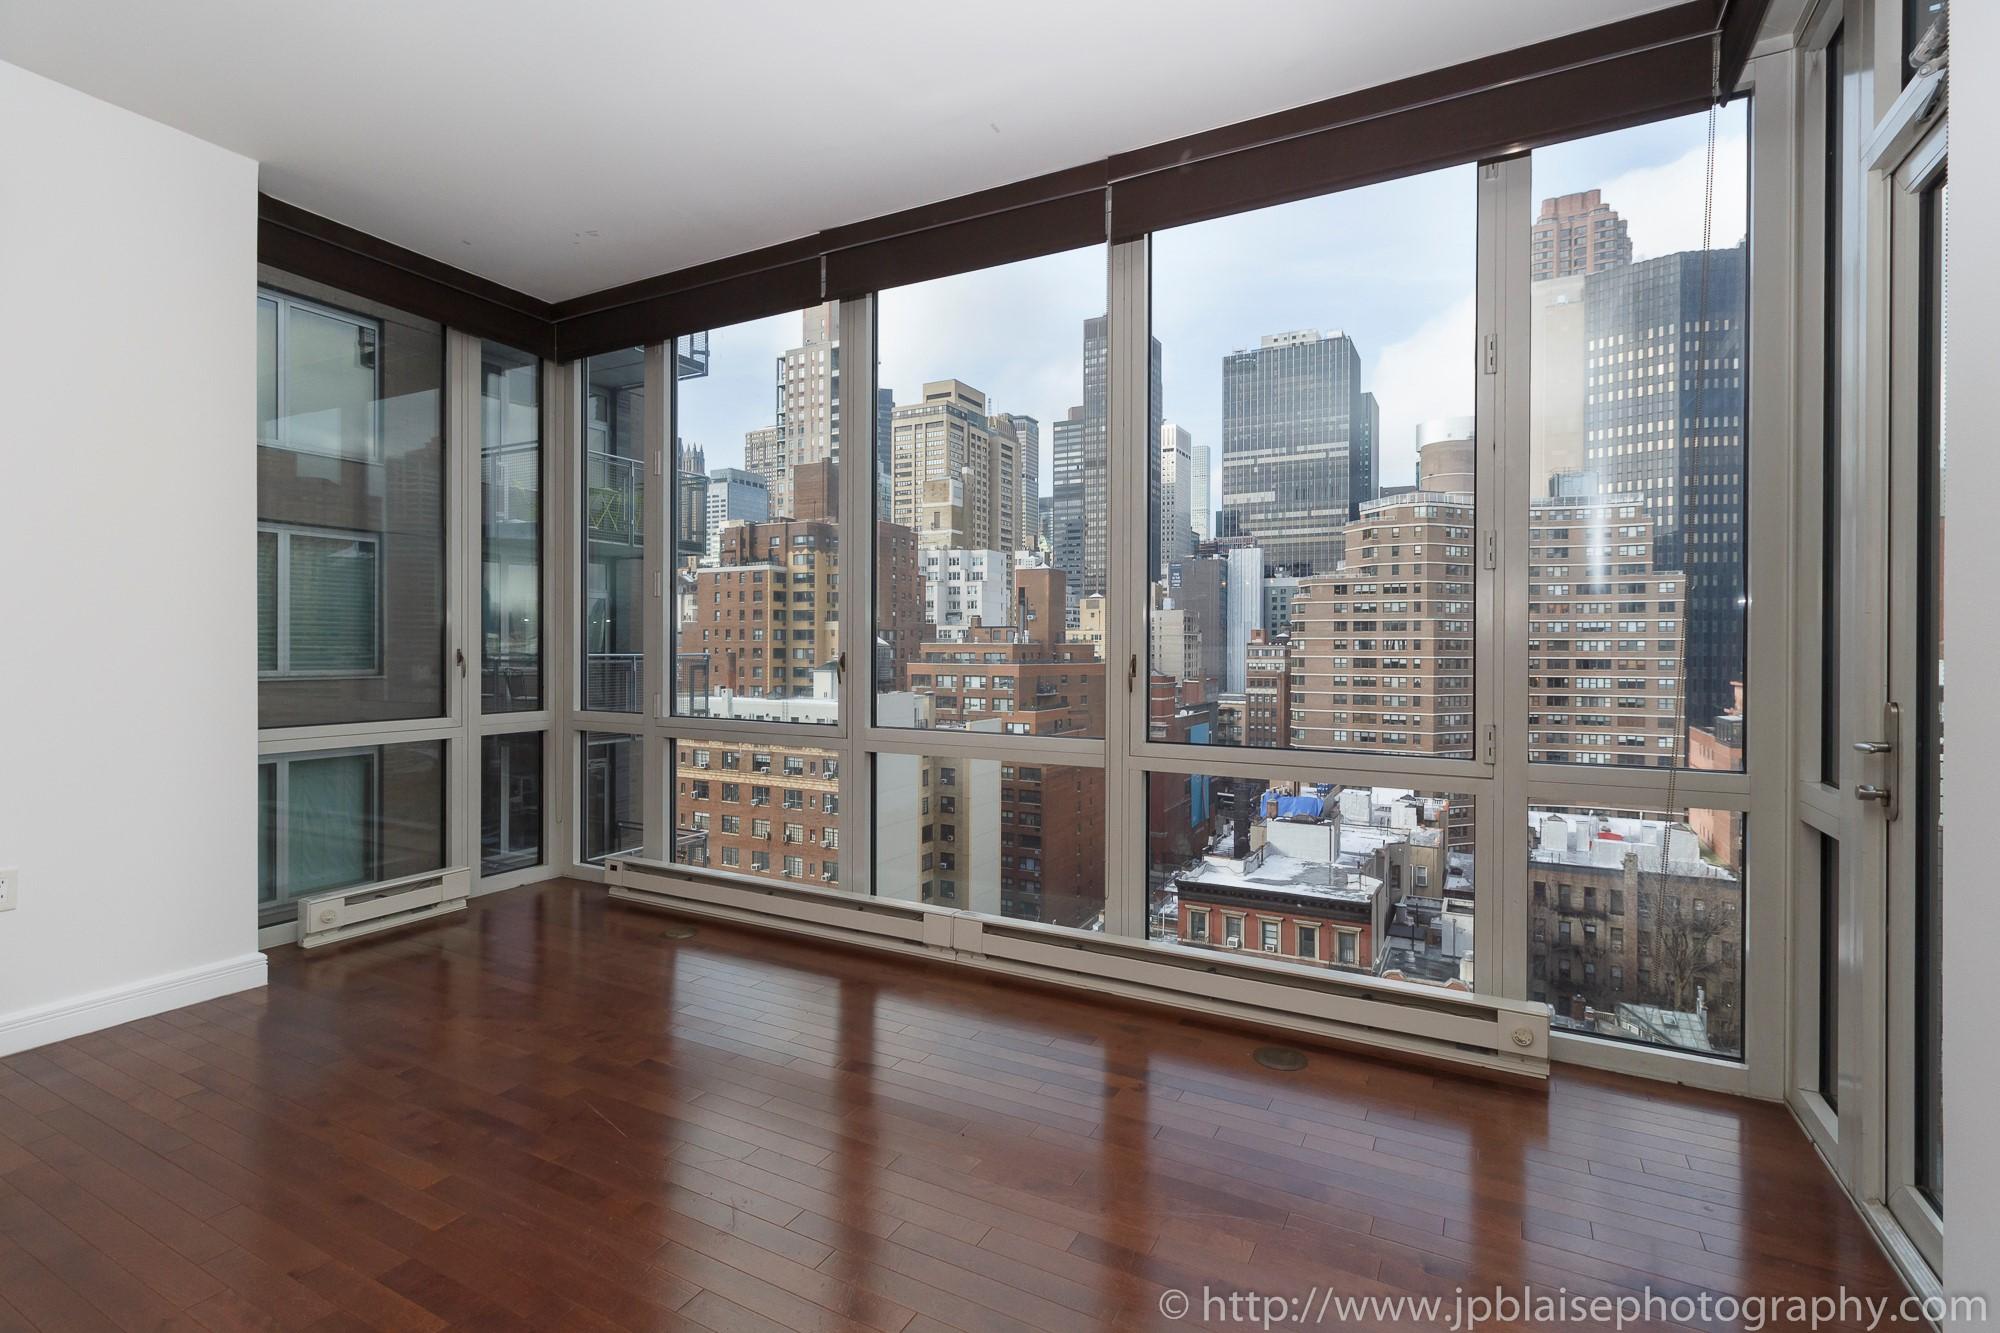 Apartment Photographer in New York: latest photoshoot (one ...